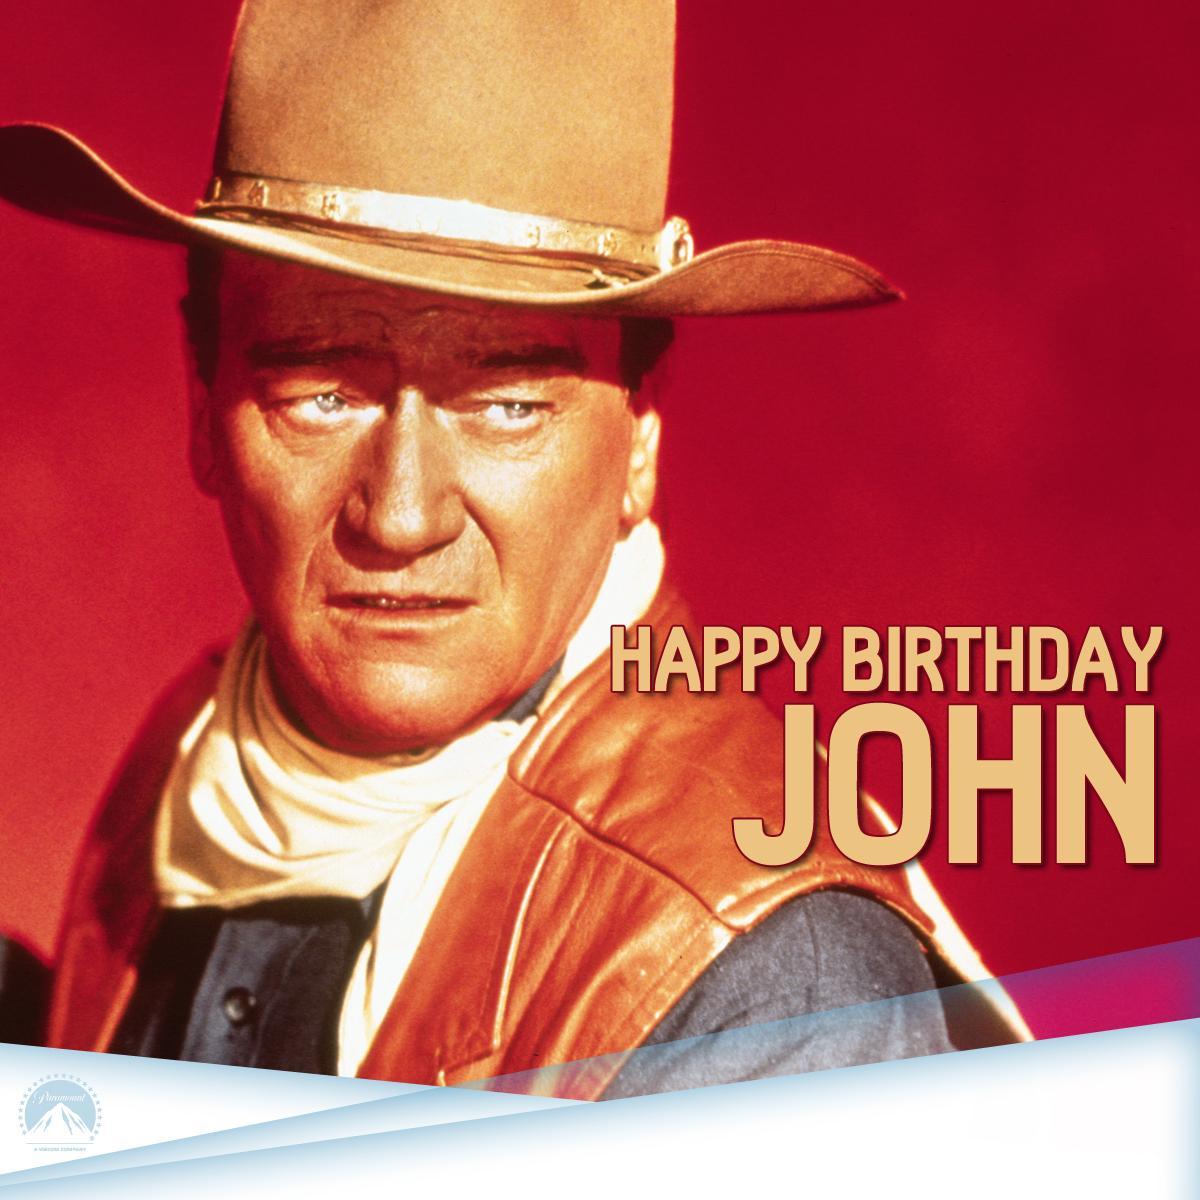 7 best Cindy Morgan images on Pinterest | Cindy morgan ...  |Happy Birthday John Wayne